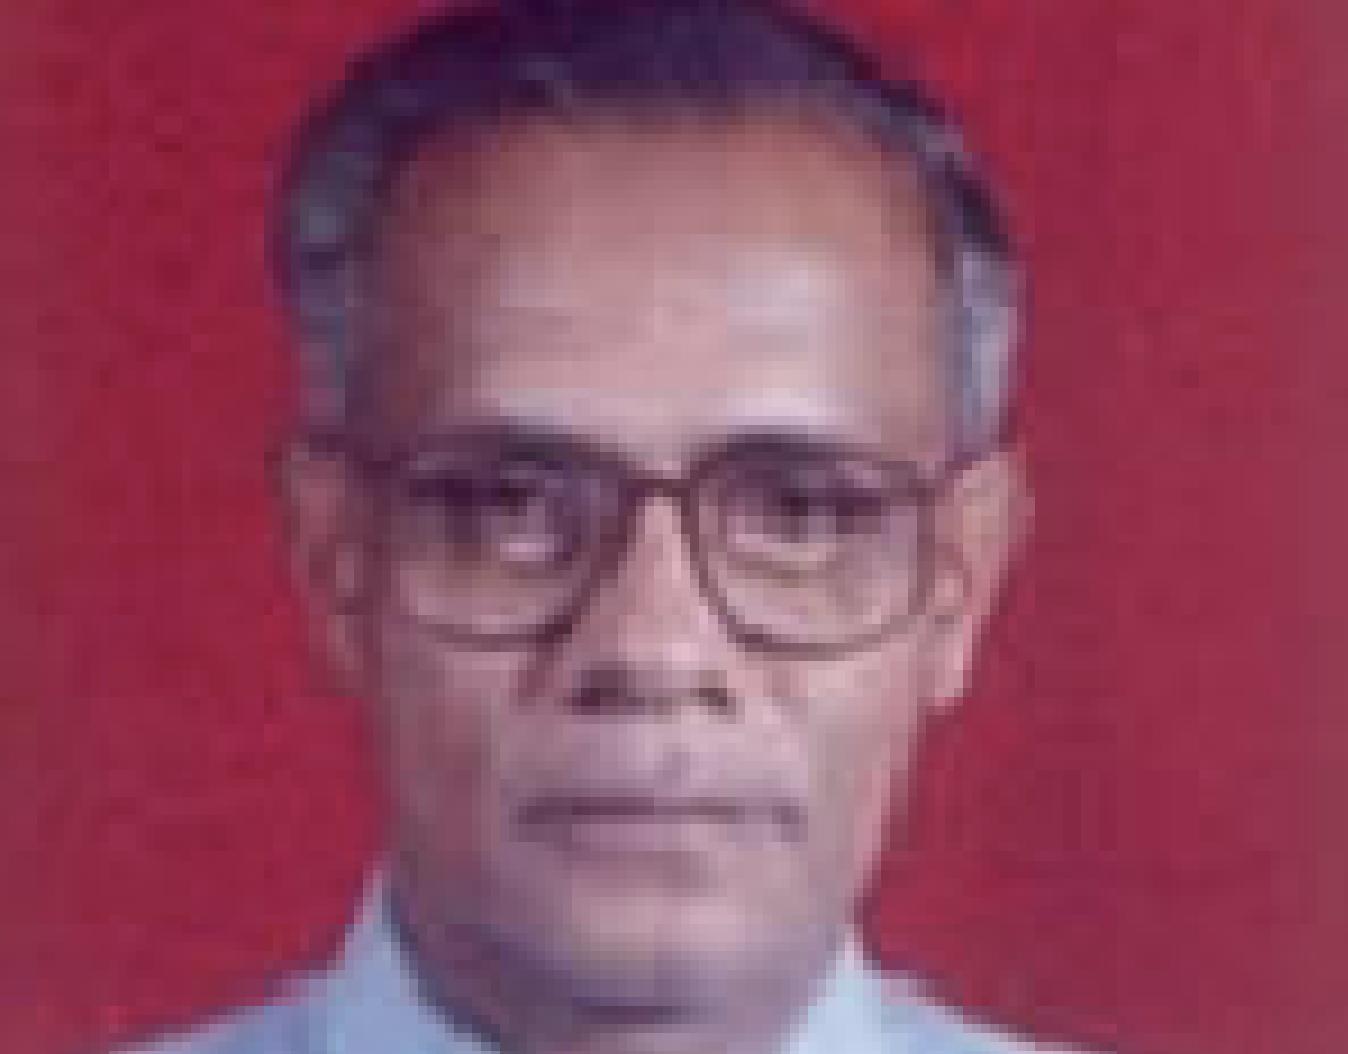 Christopher Mendonca